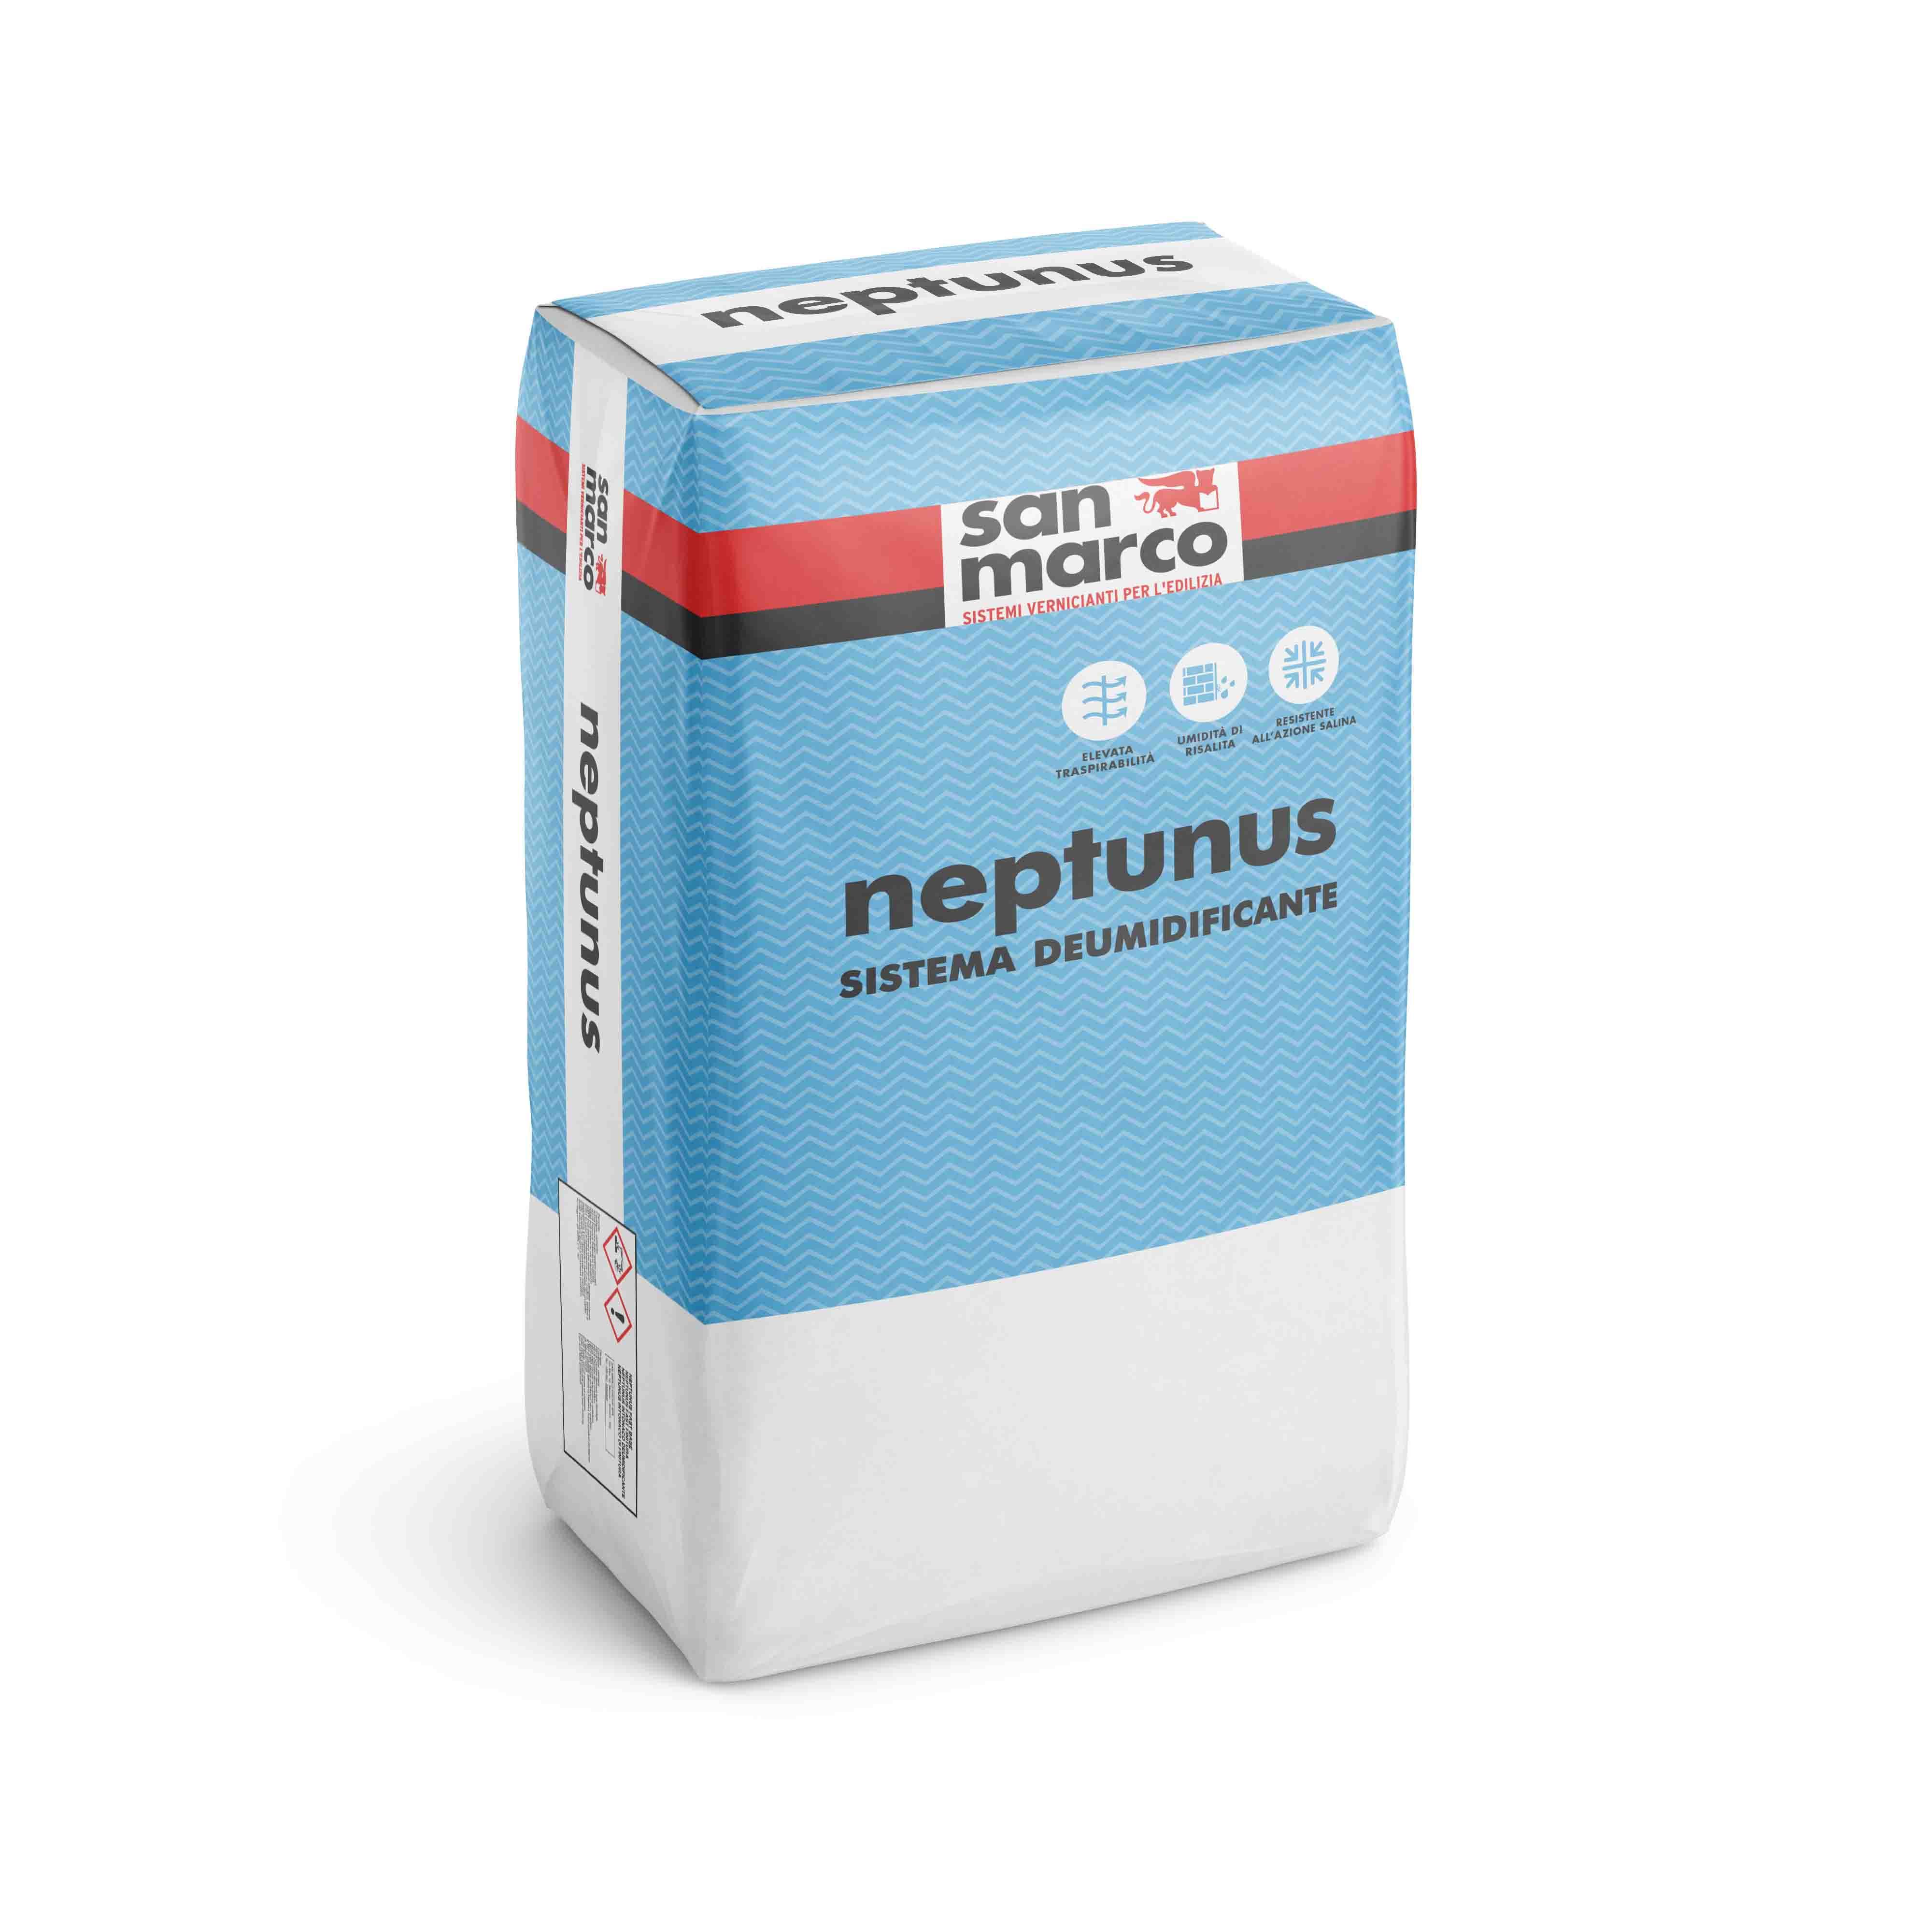 NEPTUNUS/AQUASYSTEM INTONACO DEUMIDIFICANTE